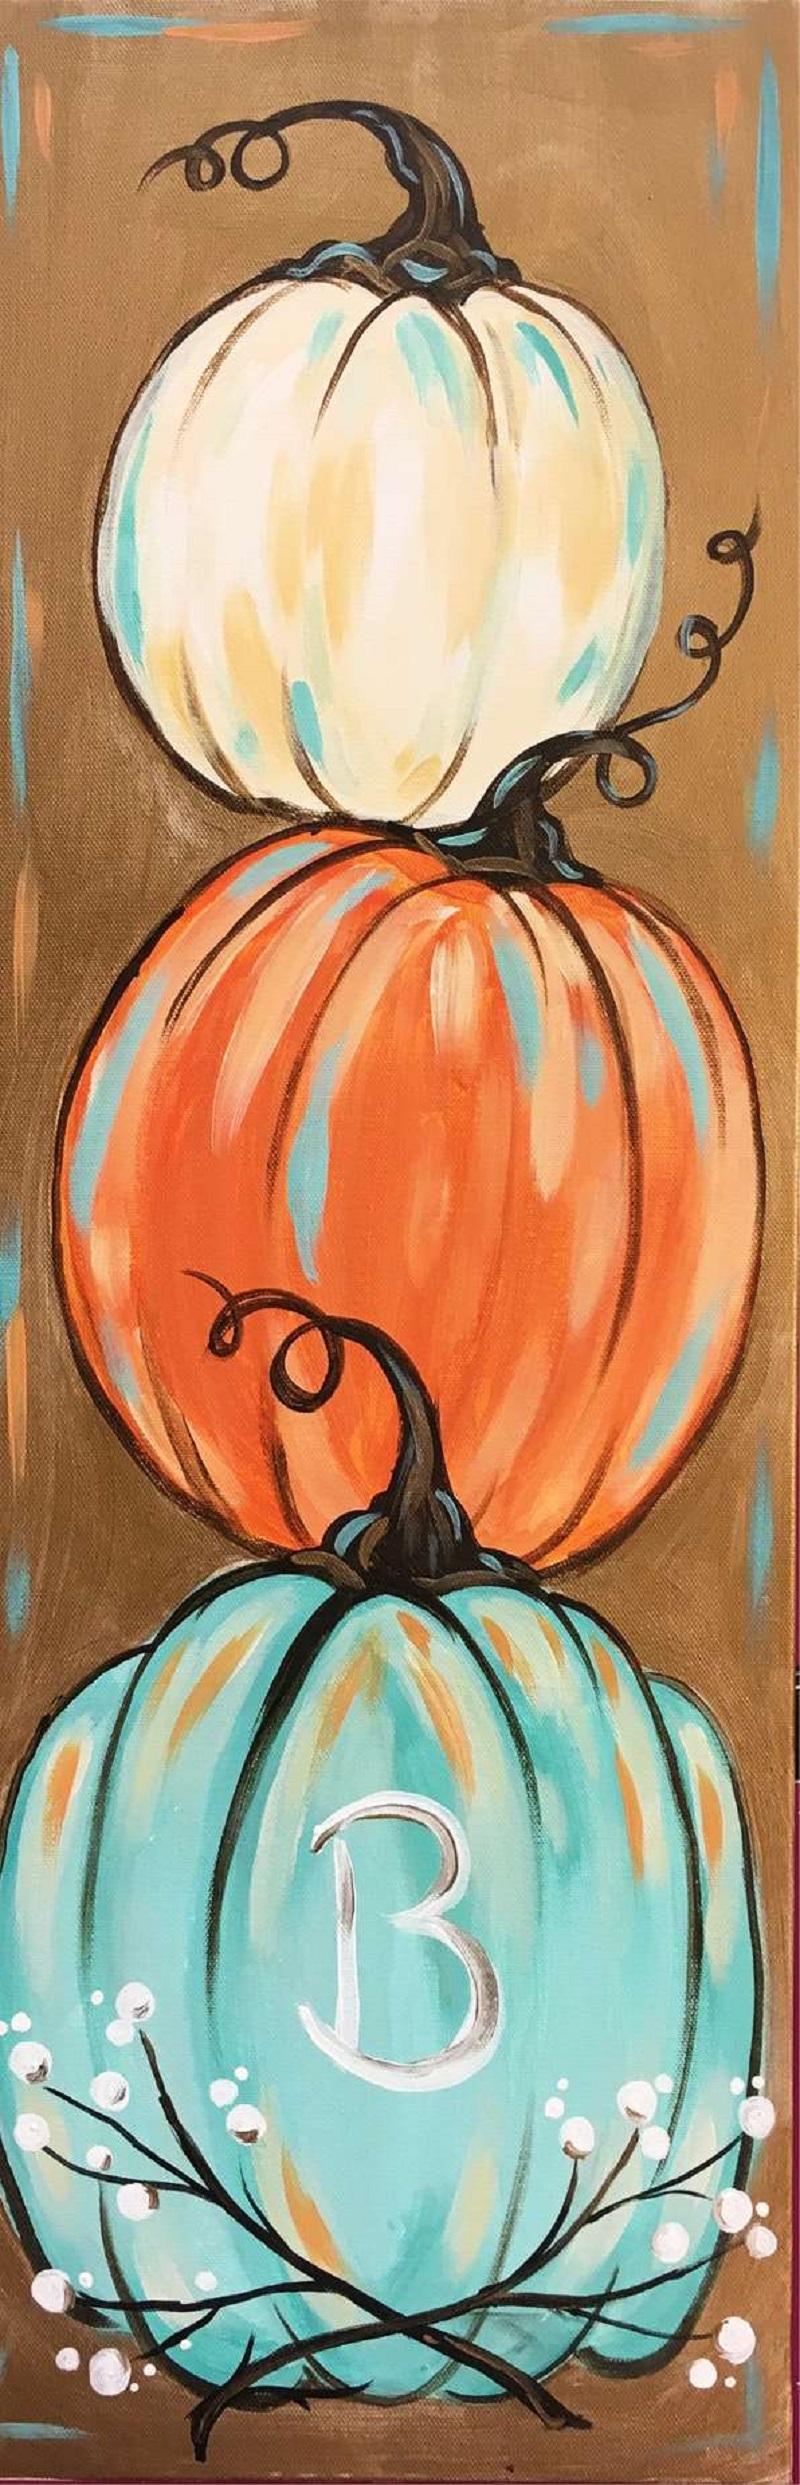 Pleasantly Pumpkin - September 18